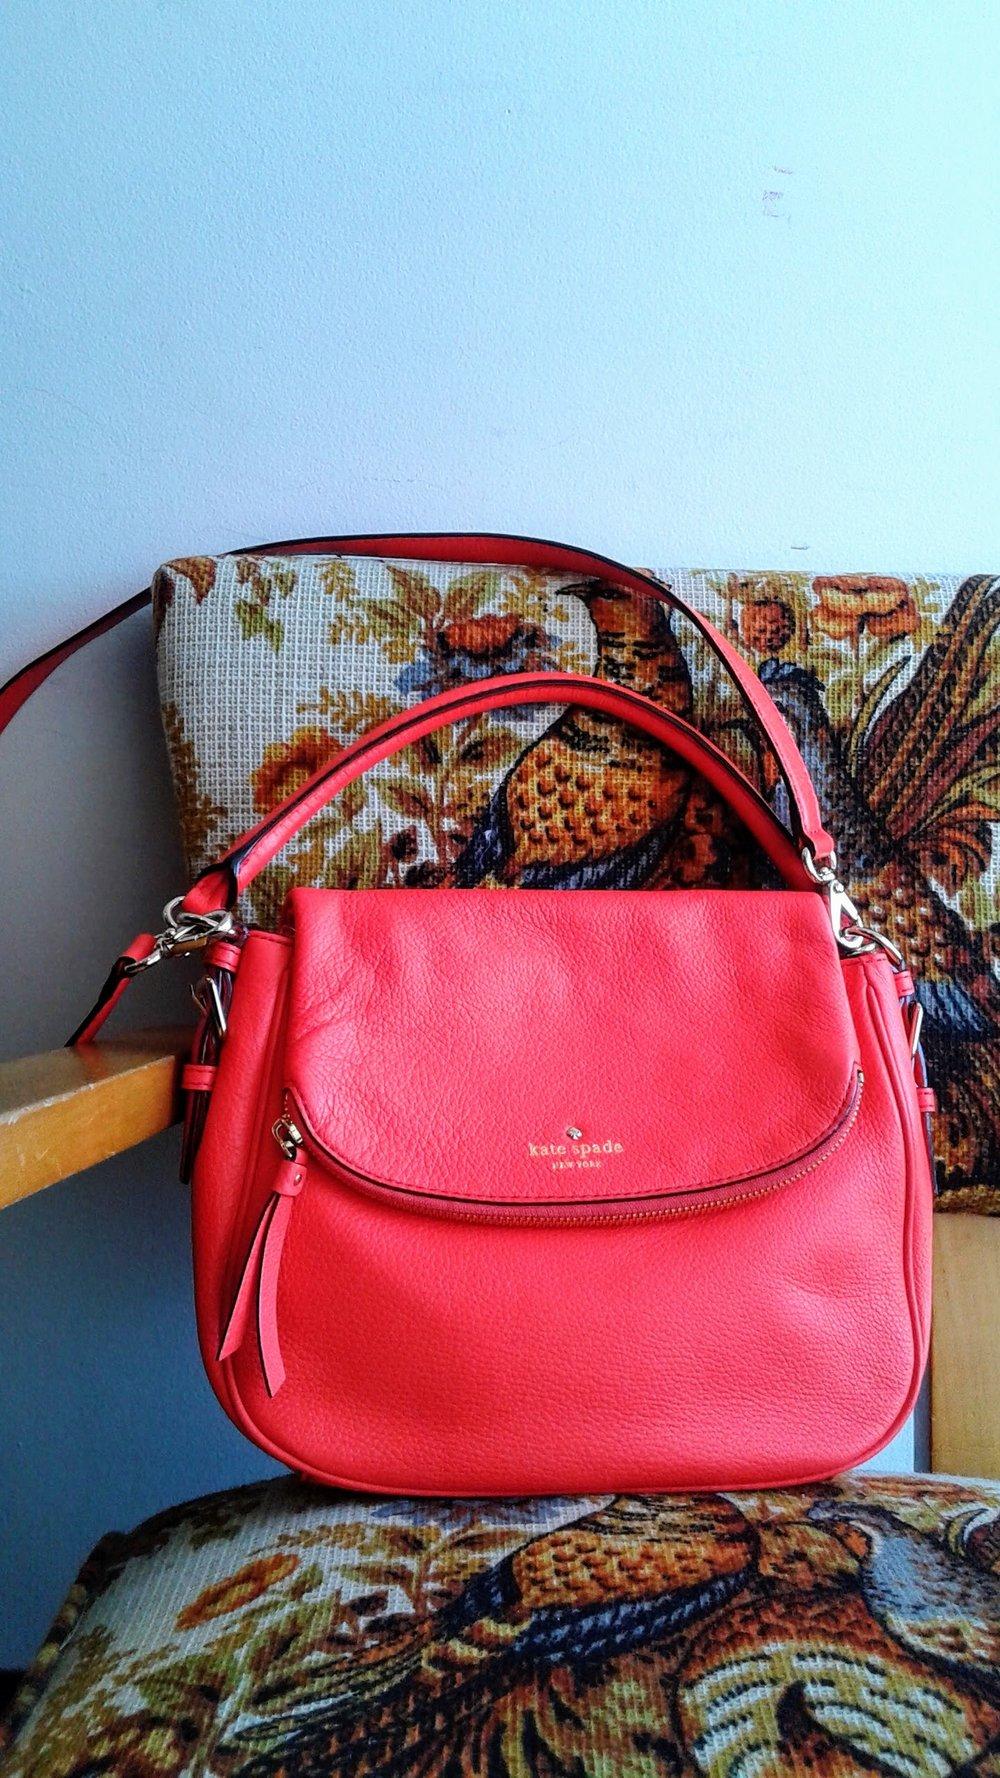 Kate Spade purse, $150